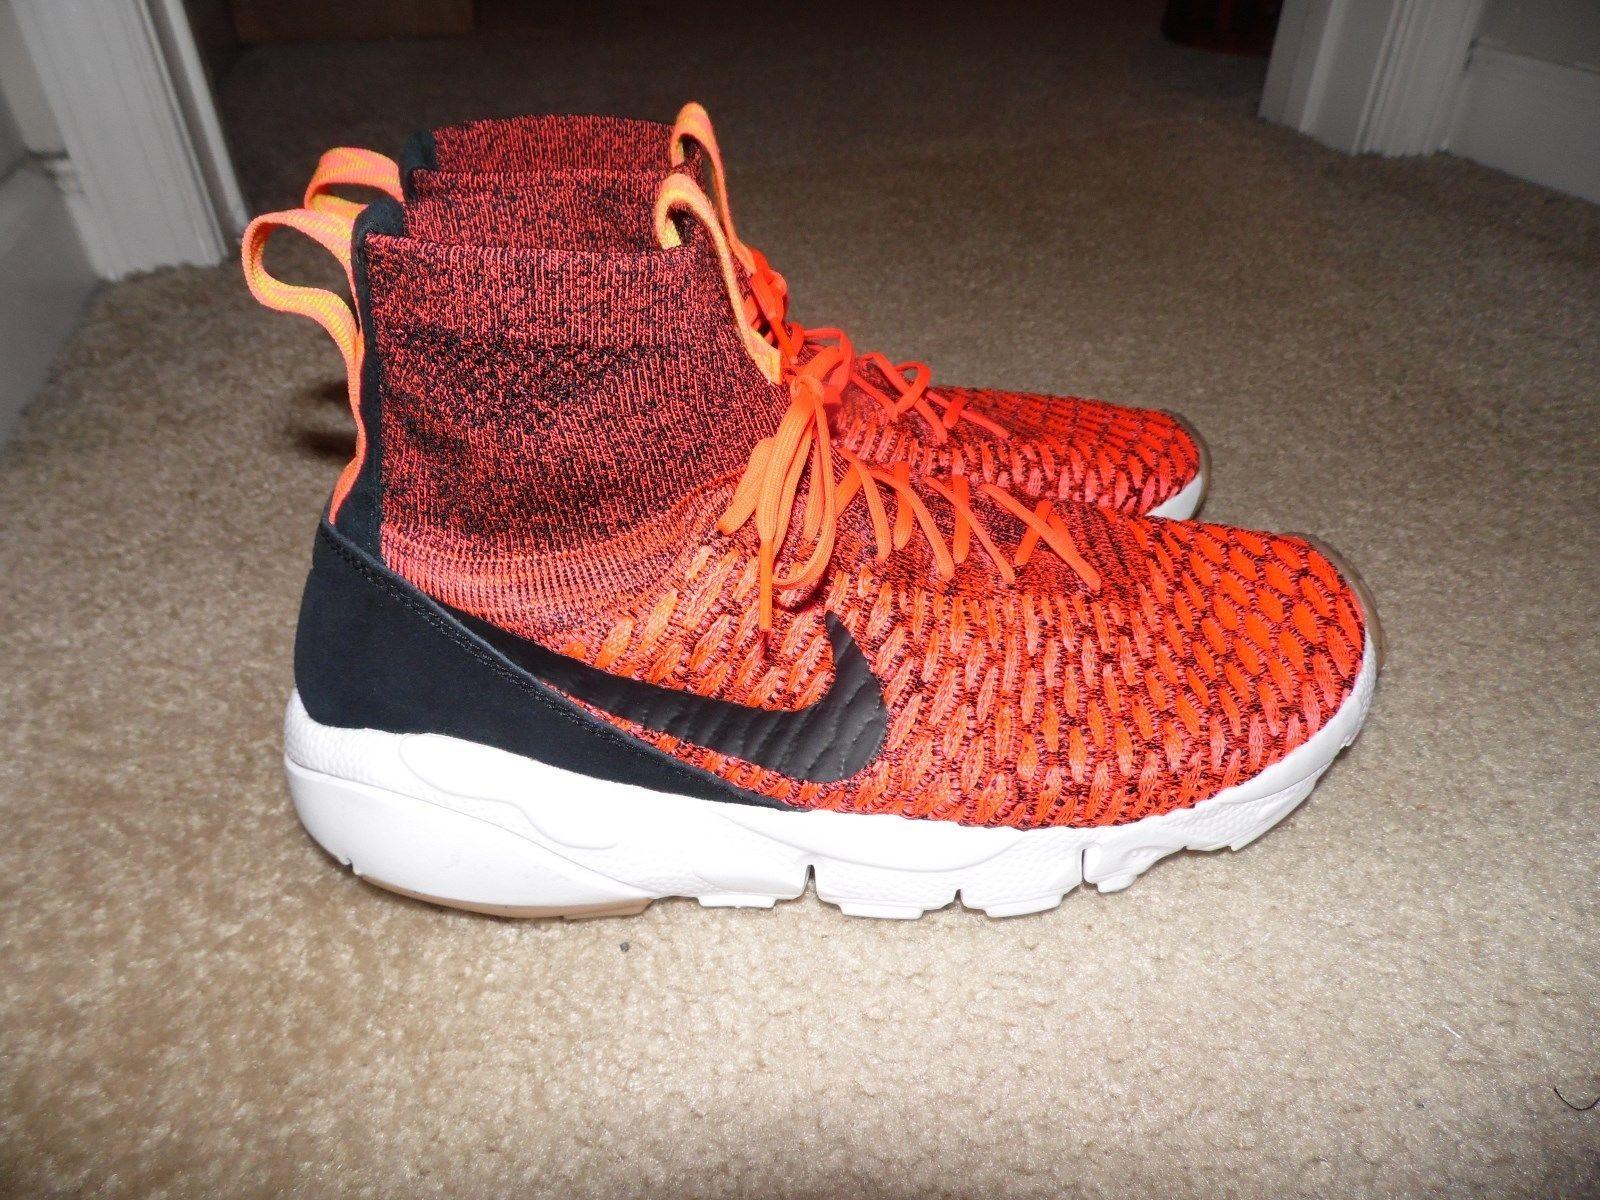 lebron james shoes red and black nike lunar trainer 1 mens training shoe